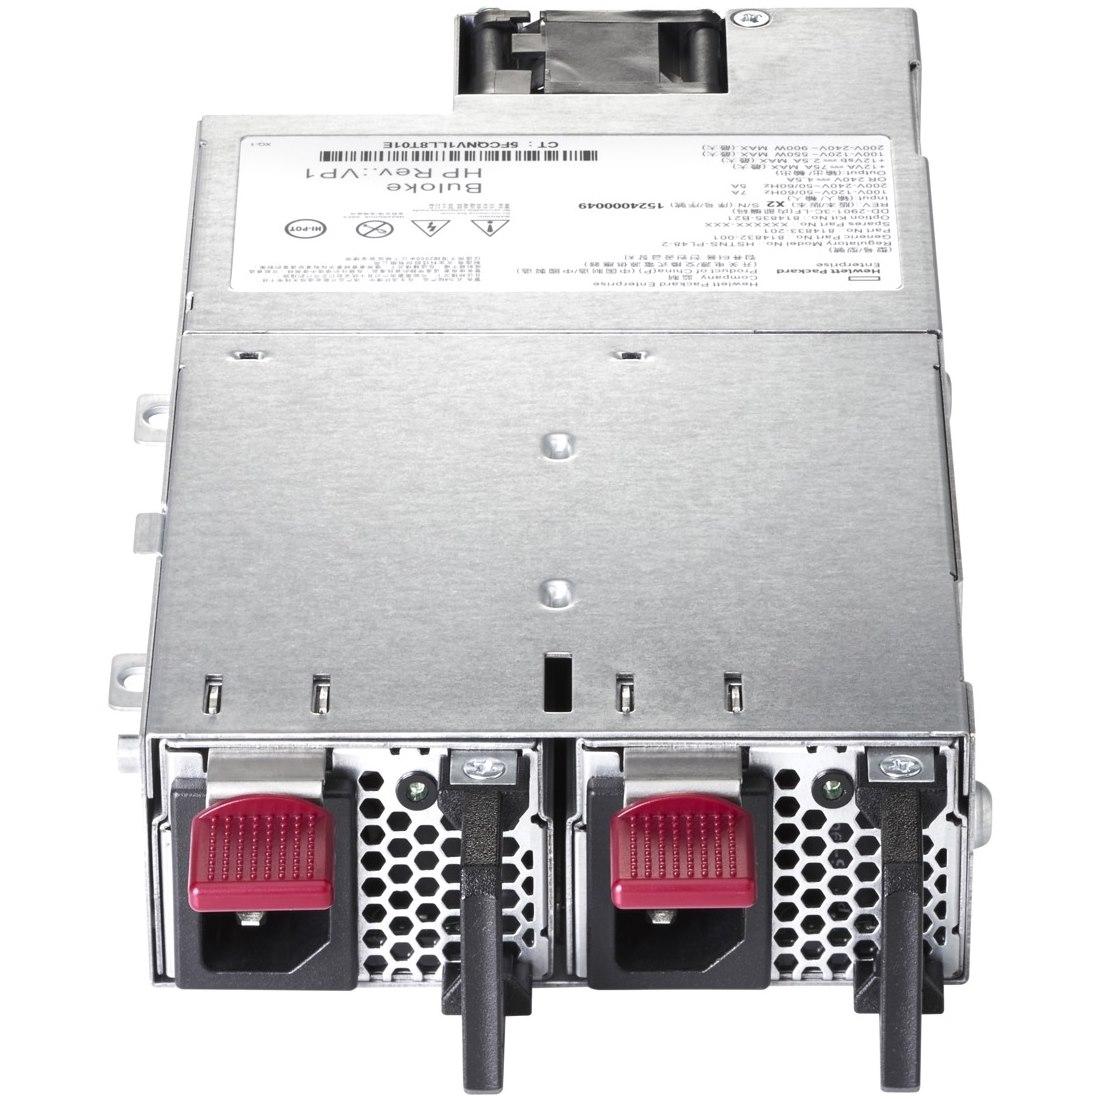 HP Redundant Power Supply - 92% Efficiency - 900 W